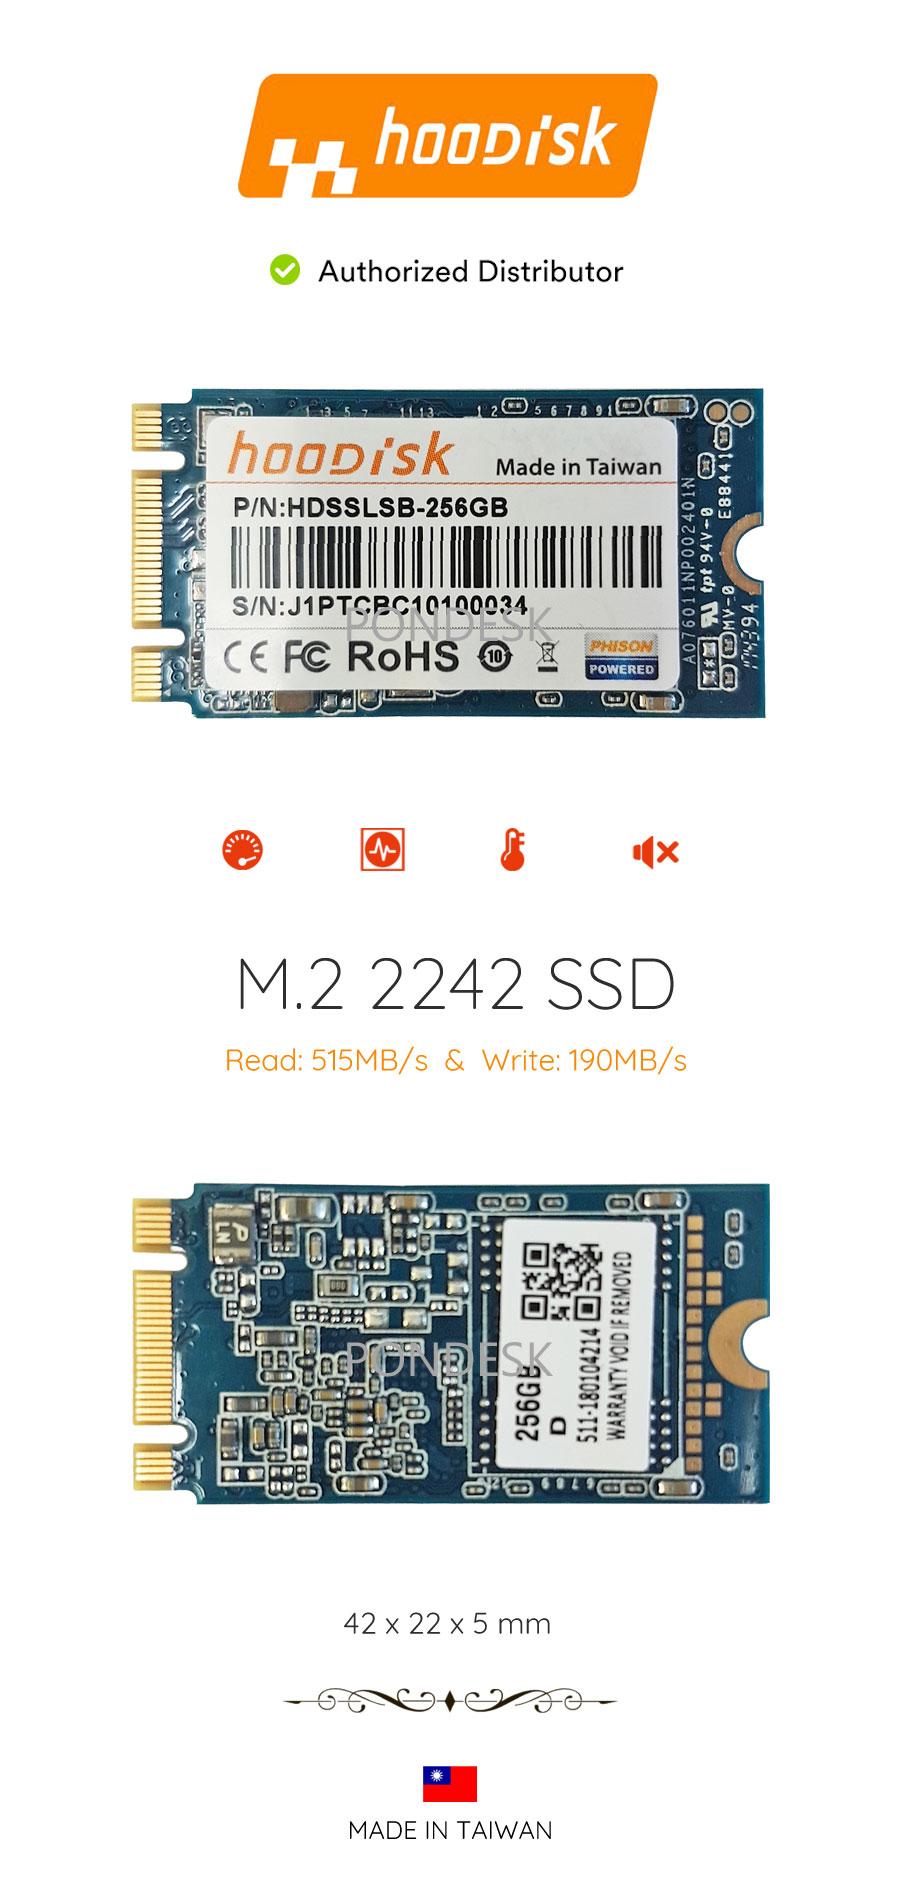 HooDisk 256GB M.2 SATA3 42mm SSD Storage Drive - UDHO-022 | Image